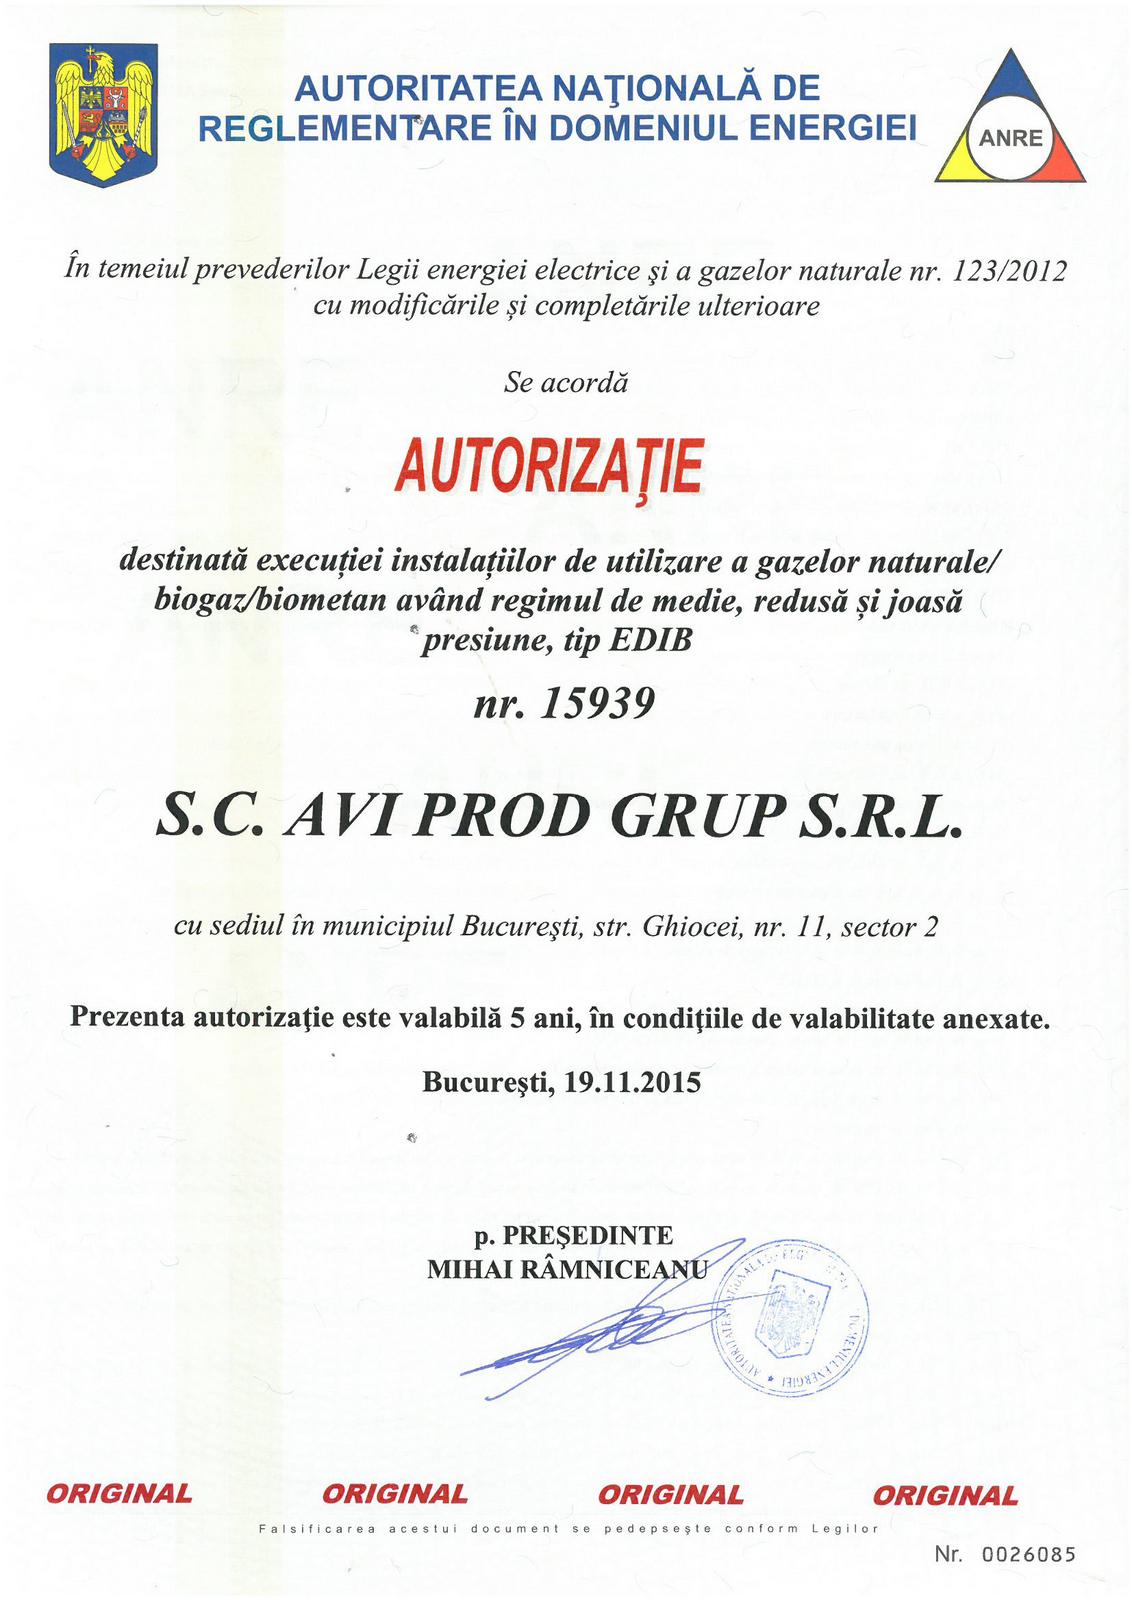 AUTORIZATIIEDSBEDIBVALABILITATE18.11.2020_Page_3